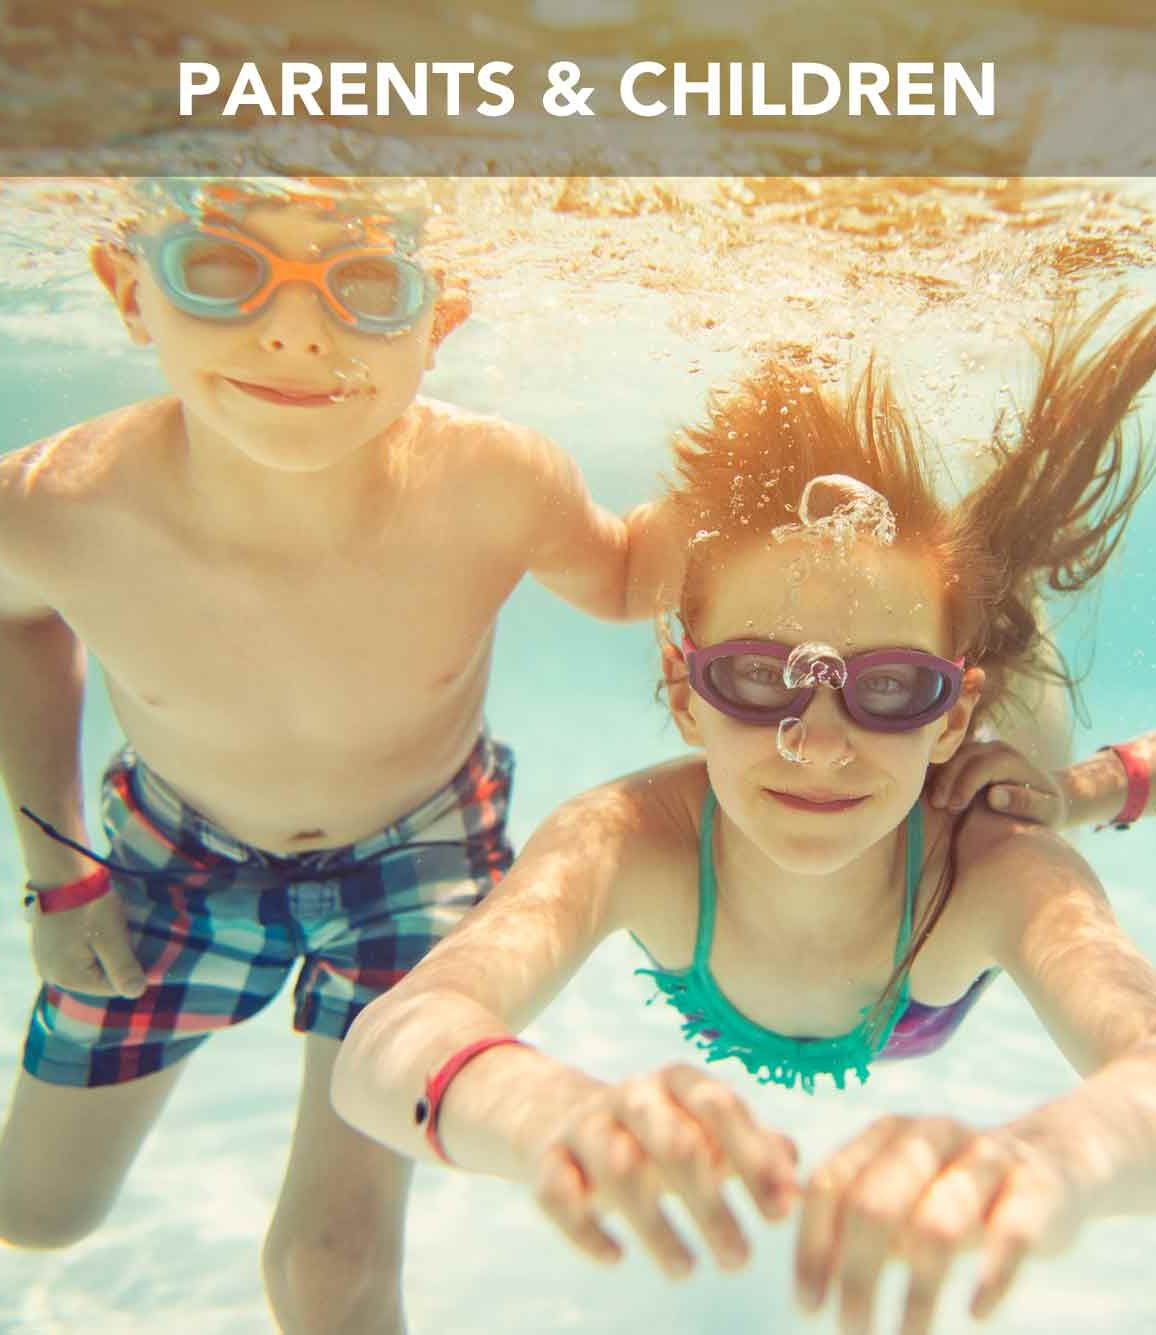 Child_psychologist_Child_psychology_Central_Ohio_counseling